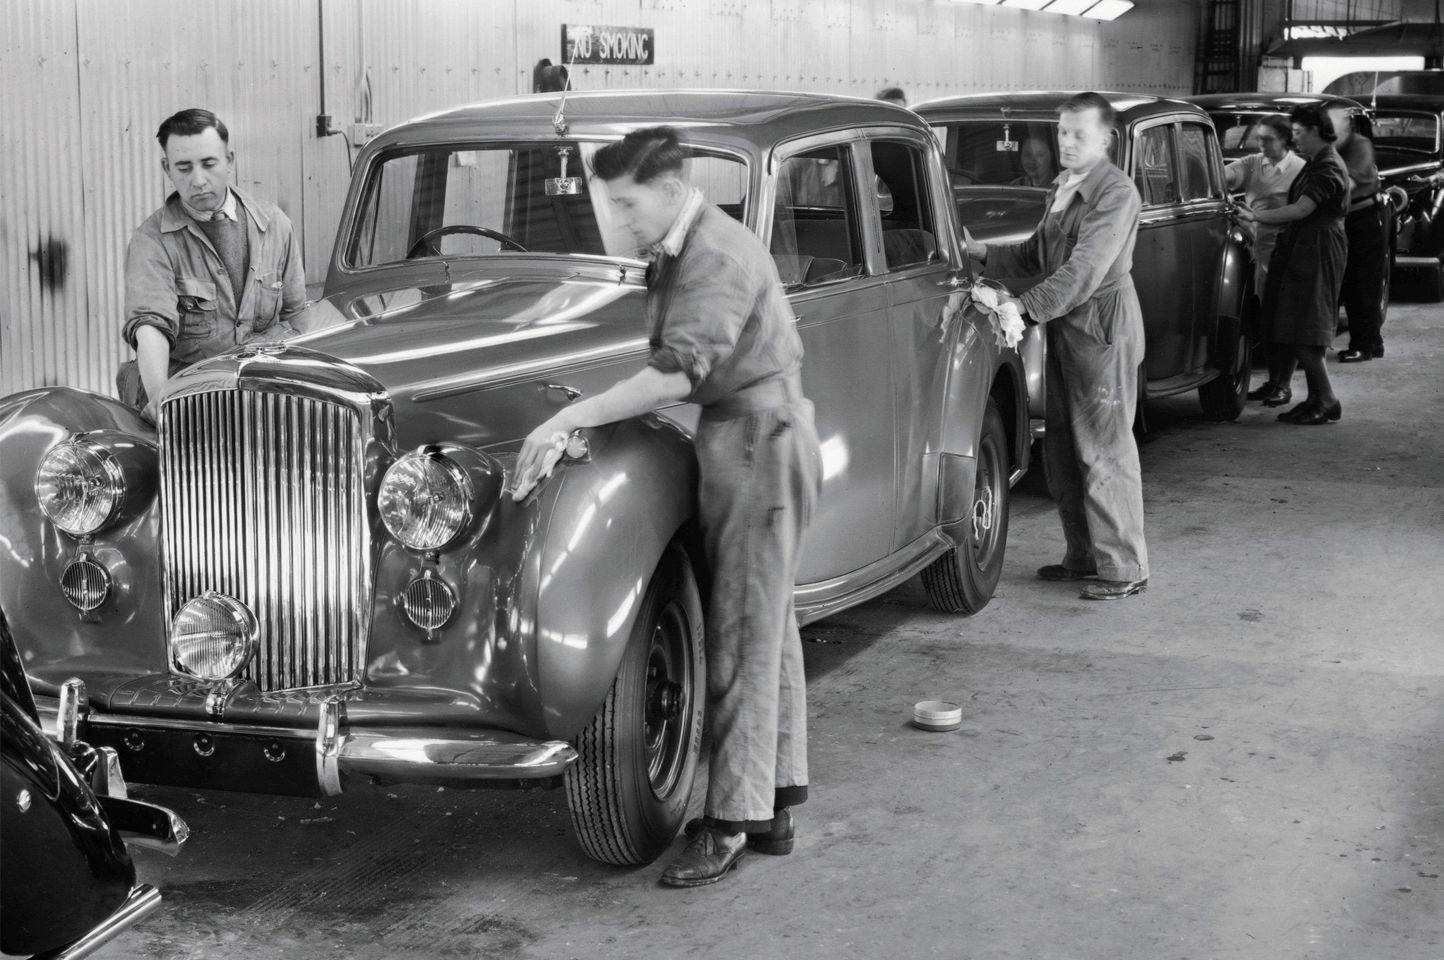 Bentley Motors celebrates 75 Years of manufacturing cars in Crewe